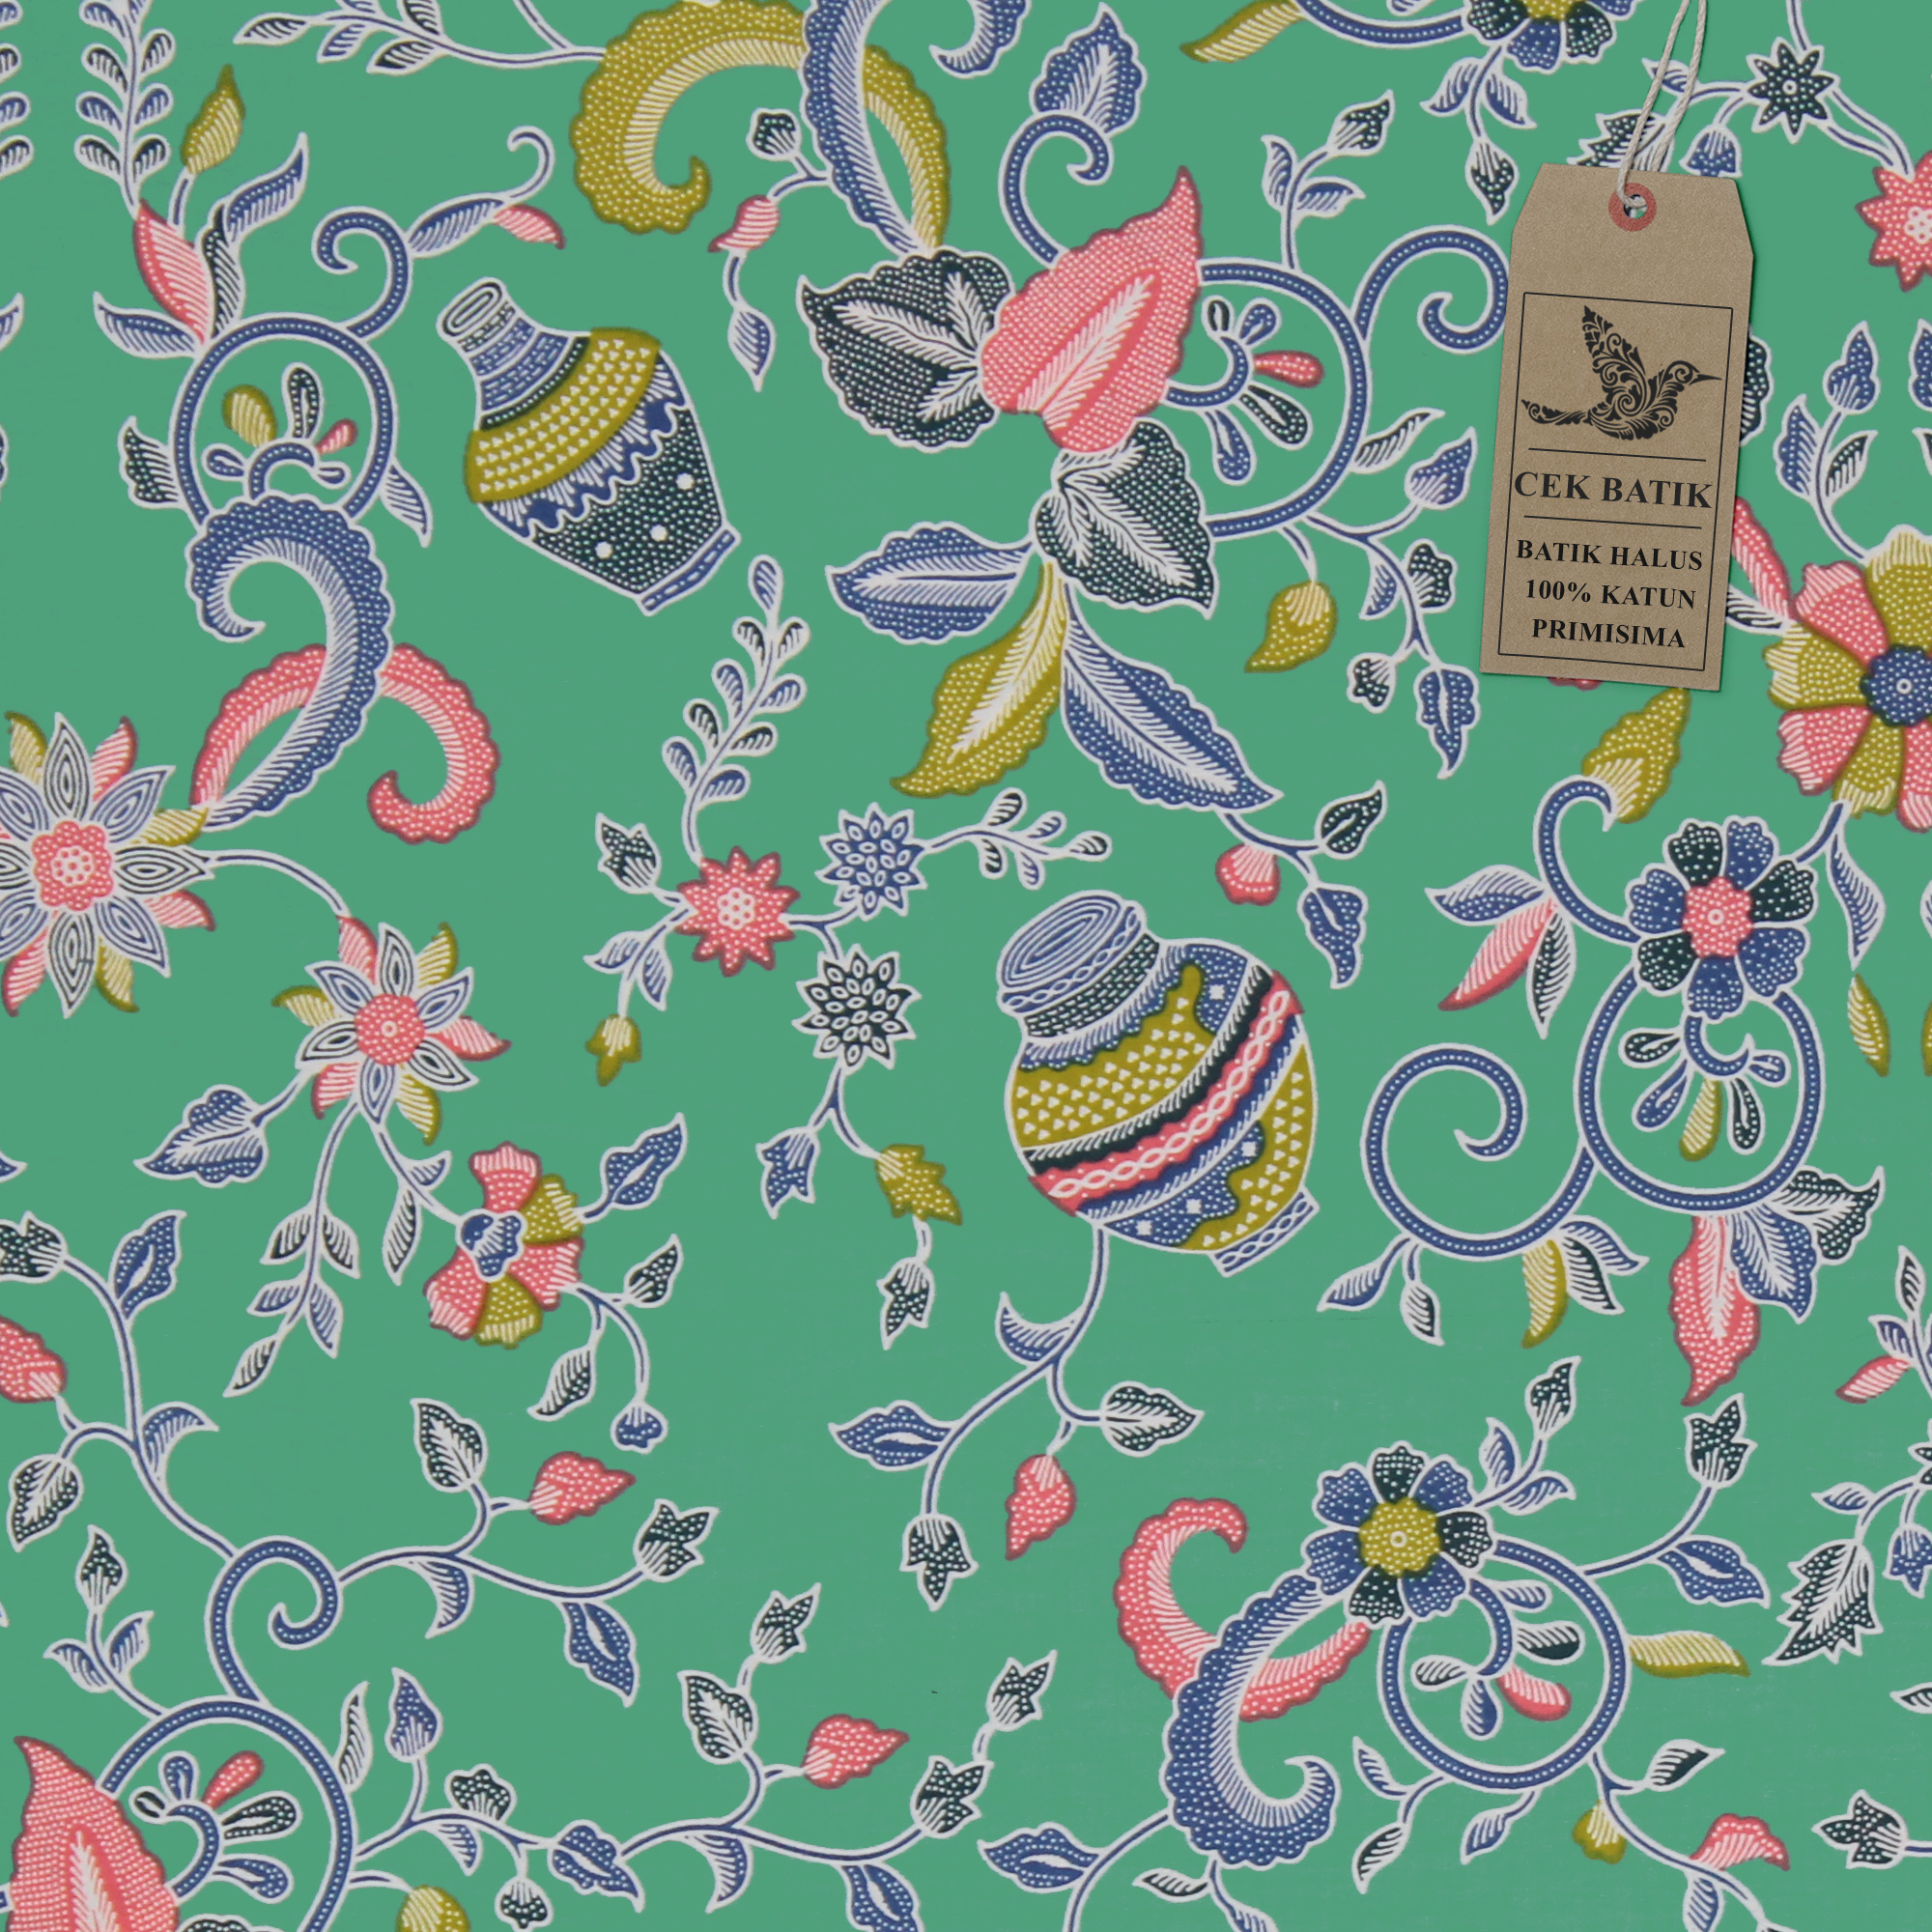 Cek Batik Kain Motif Guci Warna Unik Light Green Soft  Lazada